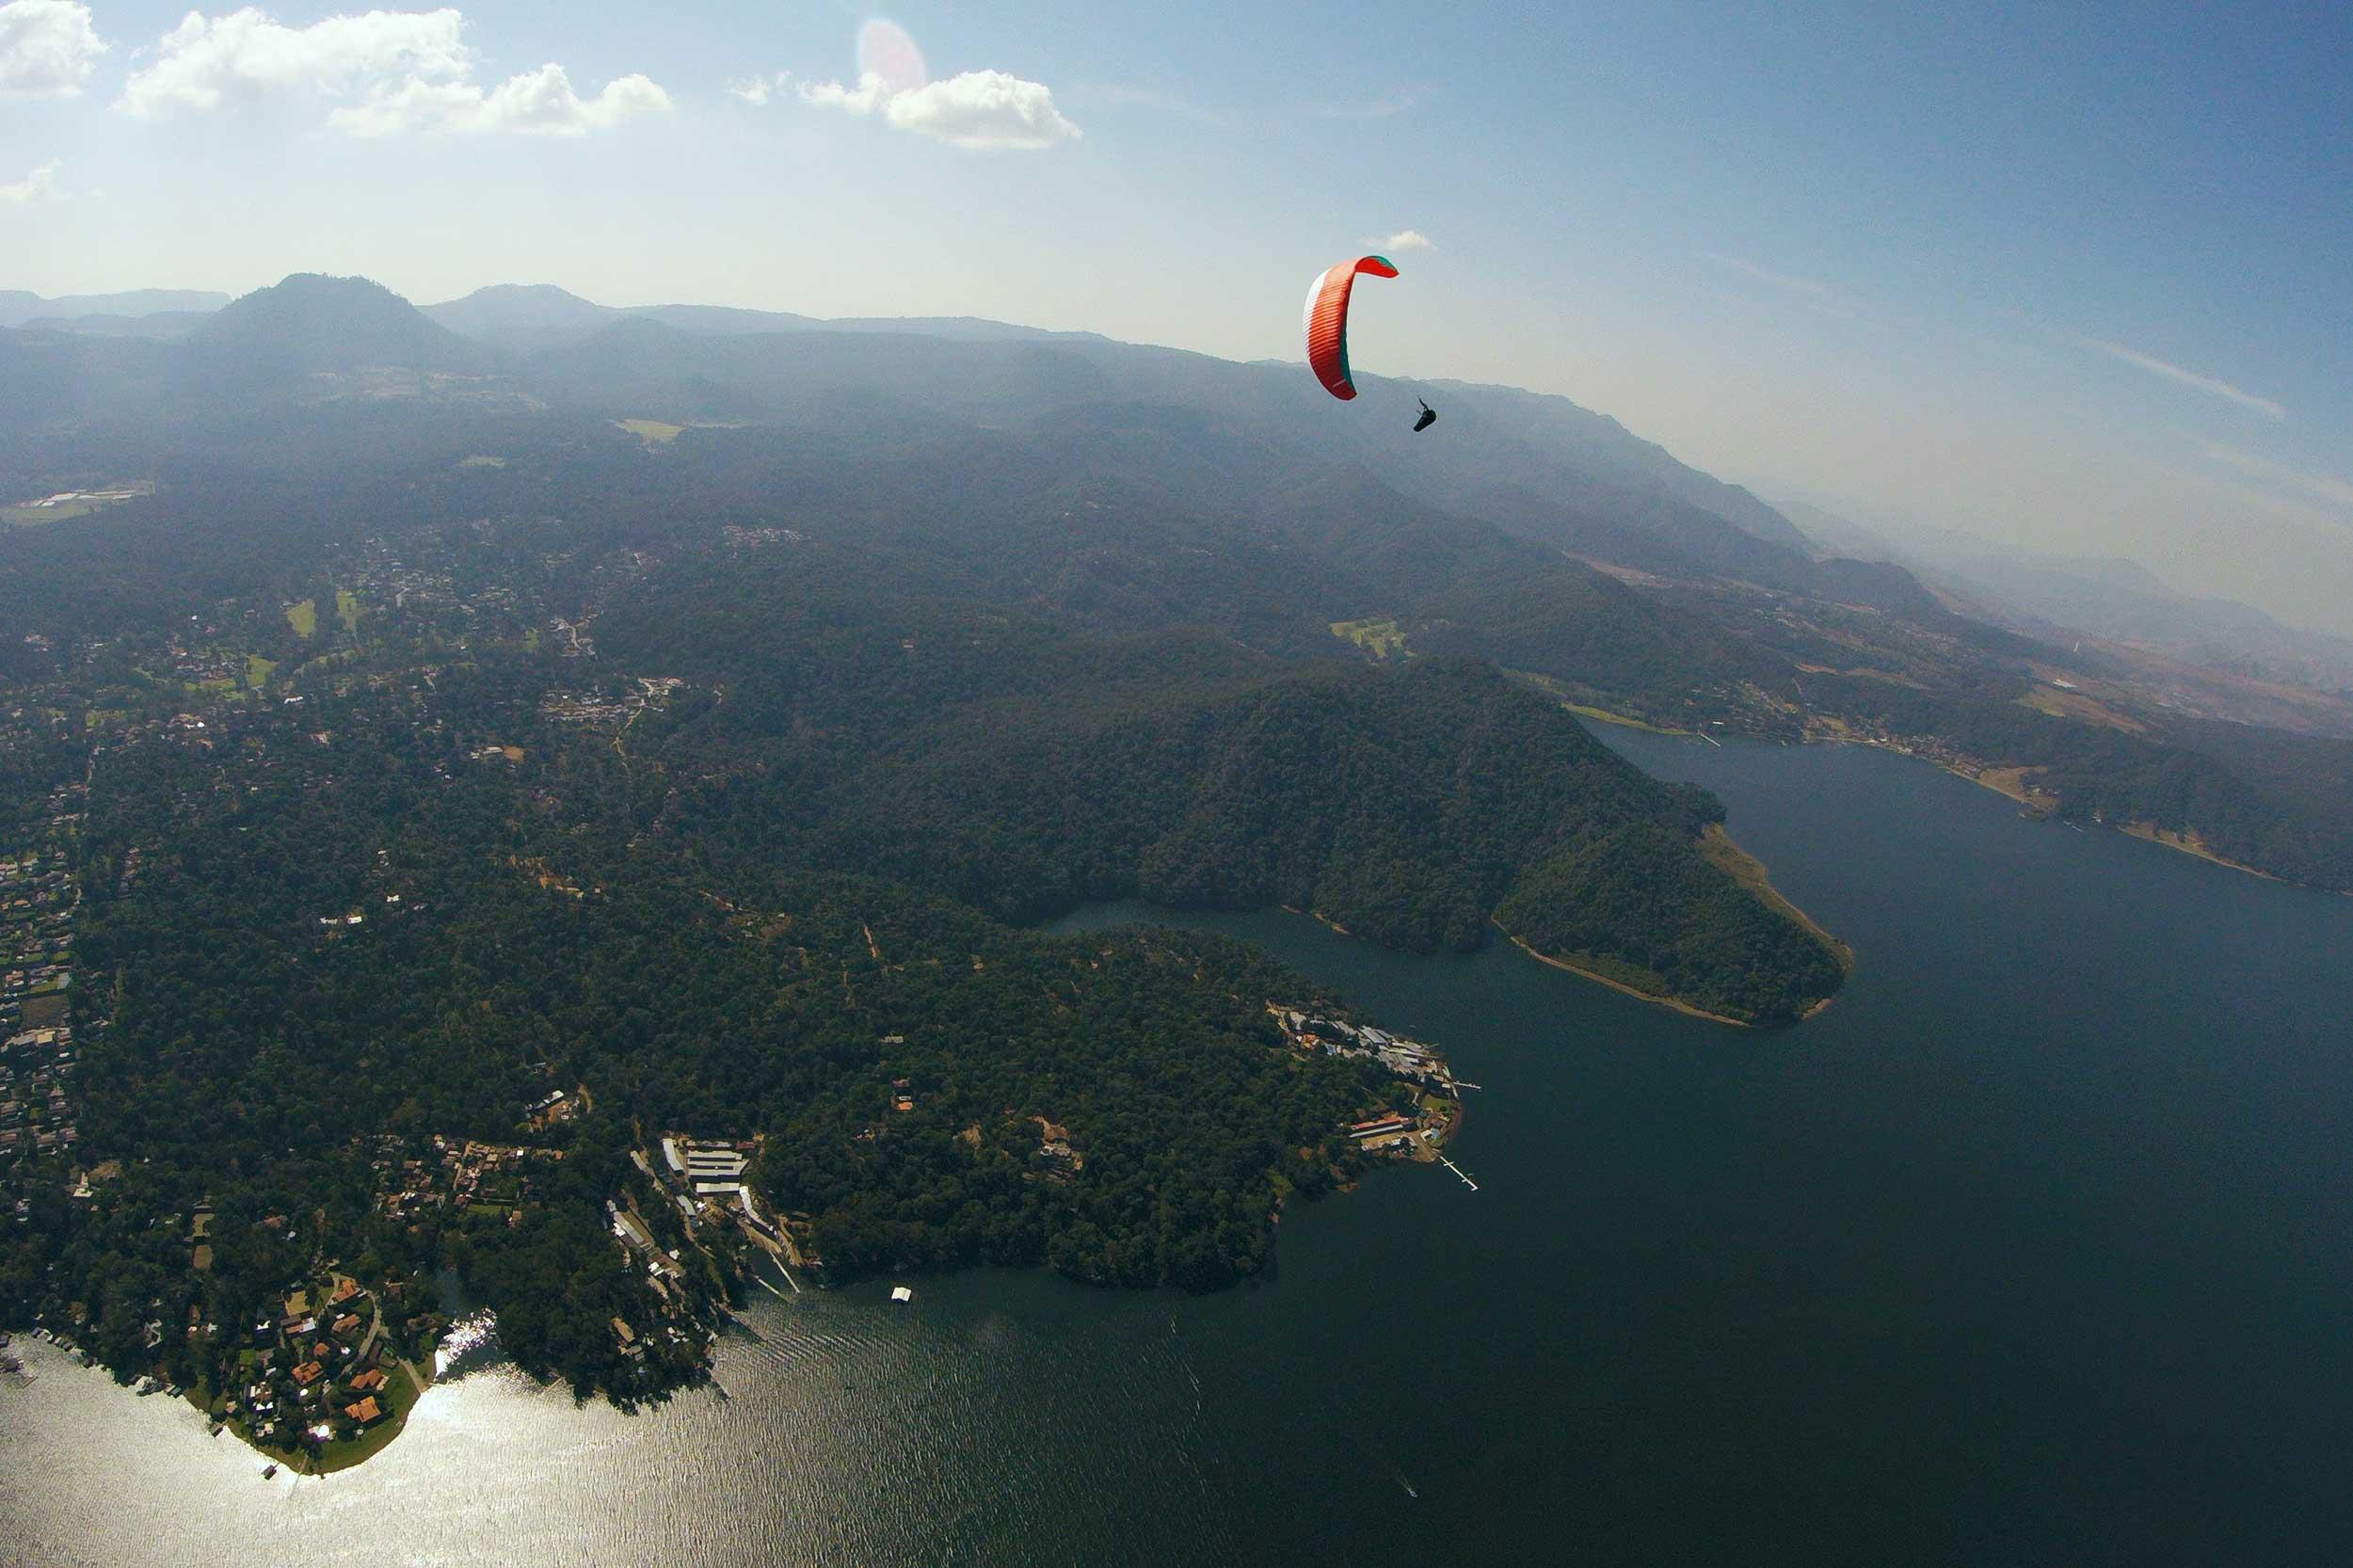 Paraglide-New-England-Trips-Valle-de-Bravo-Mexico-Gallery-Calef-Spiral.jpg